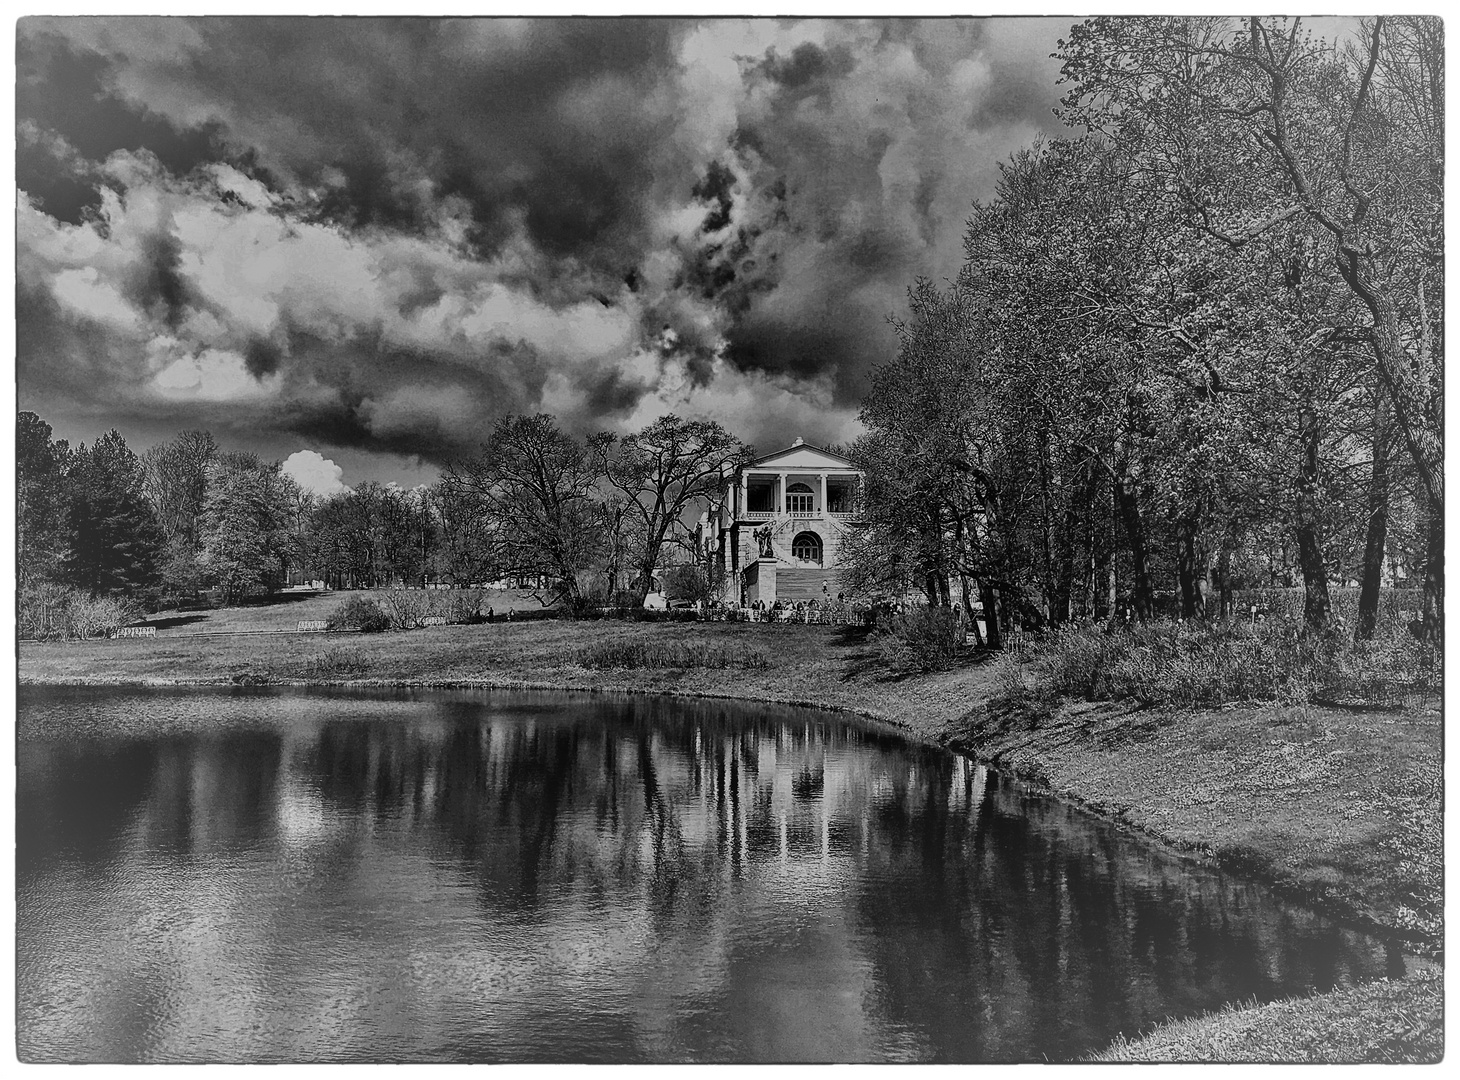 Sturm im Garten des Katharinenpalastes